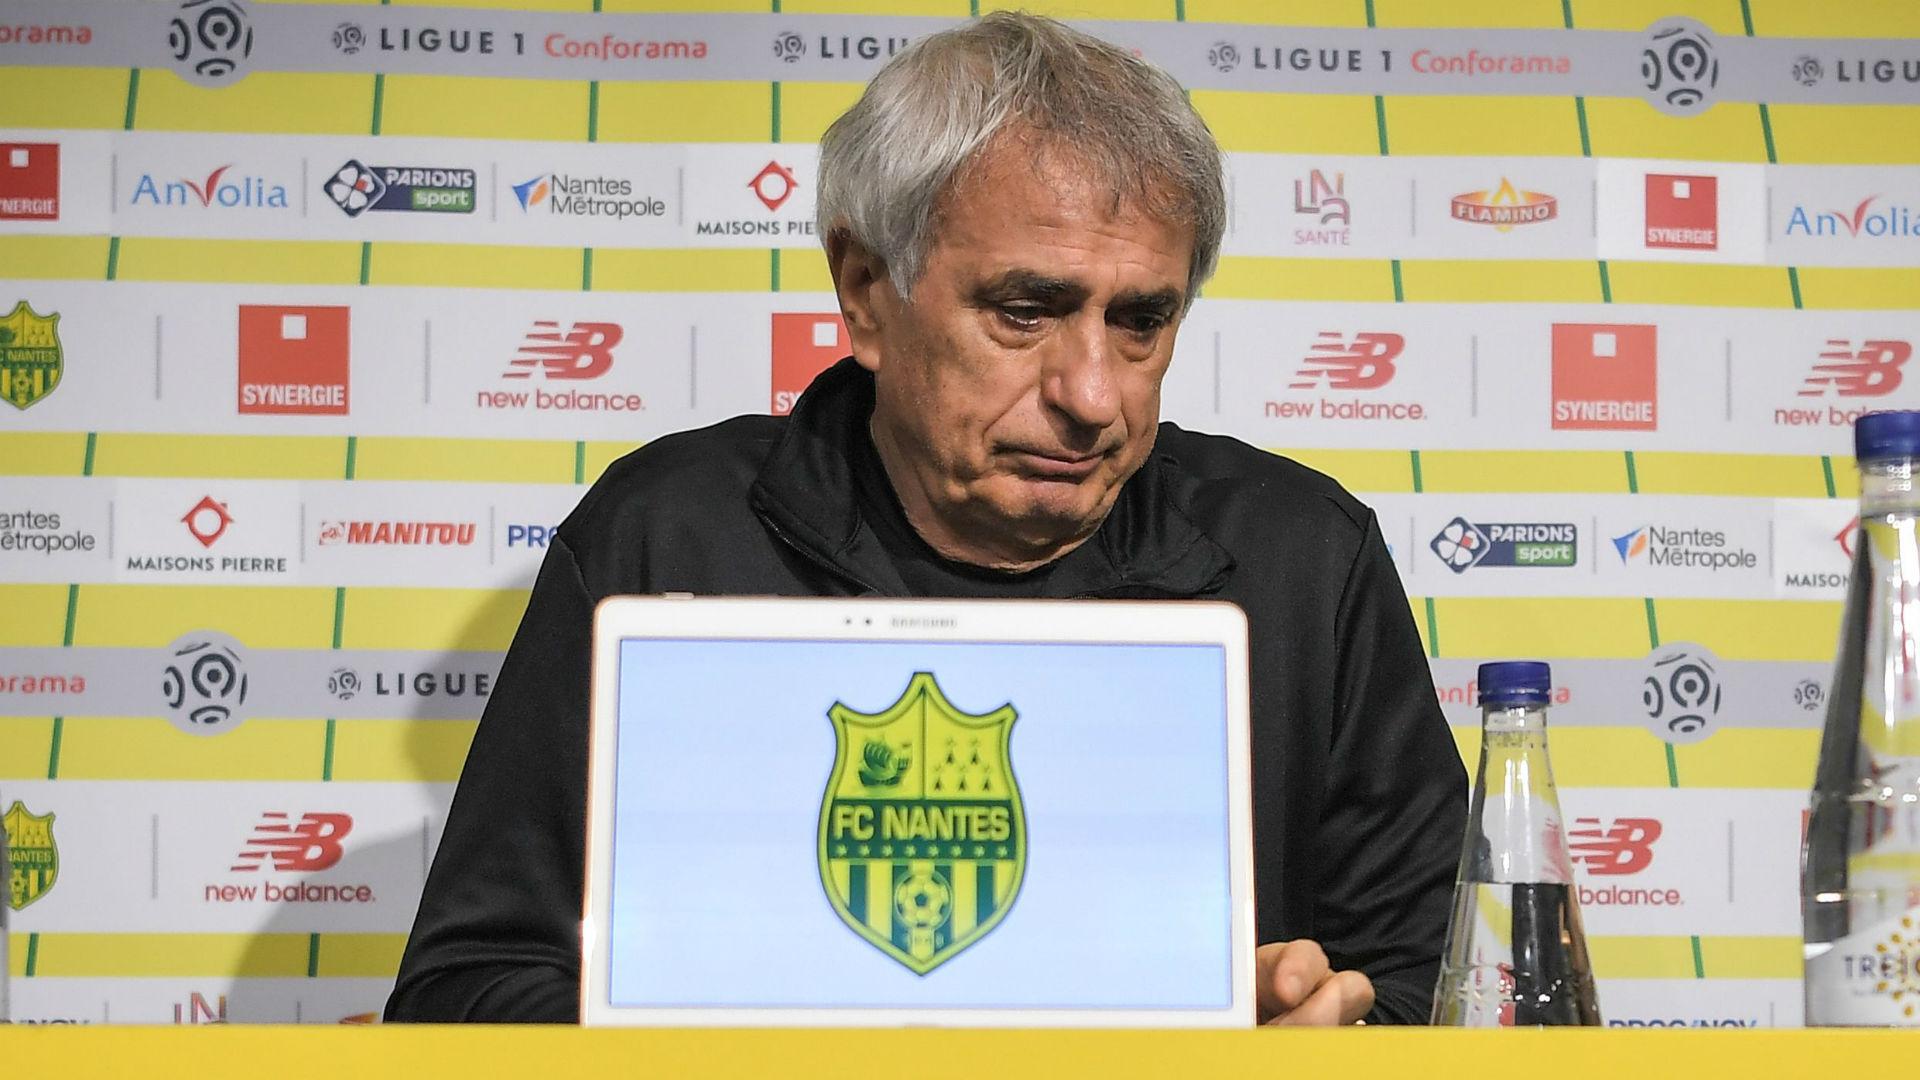 Vahid Halilhodzic Nantes 08 02 2019